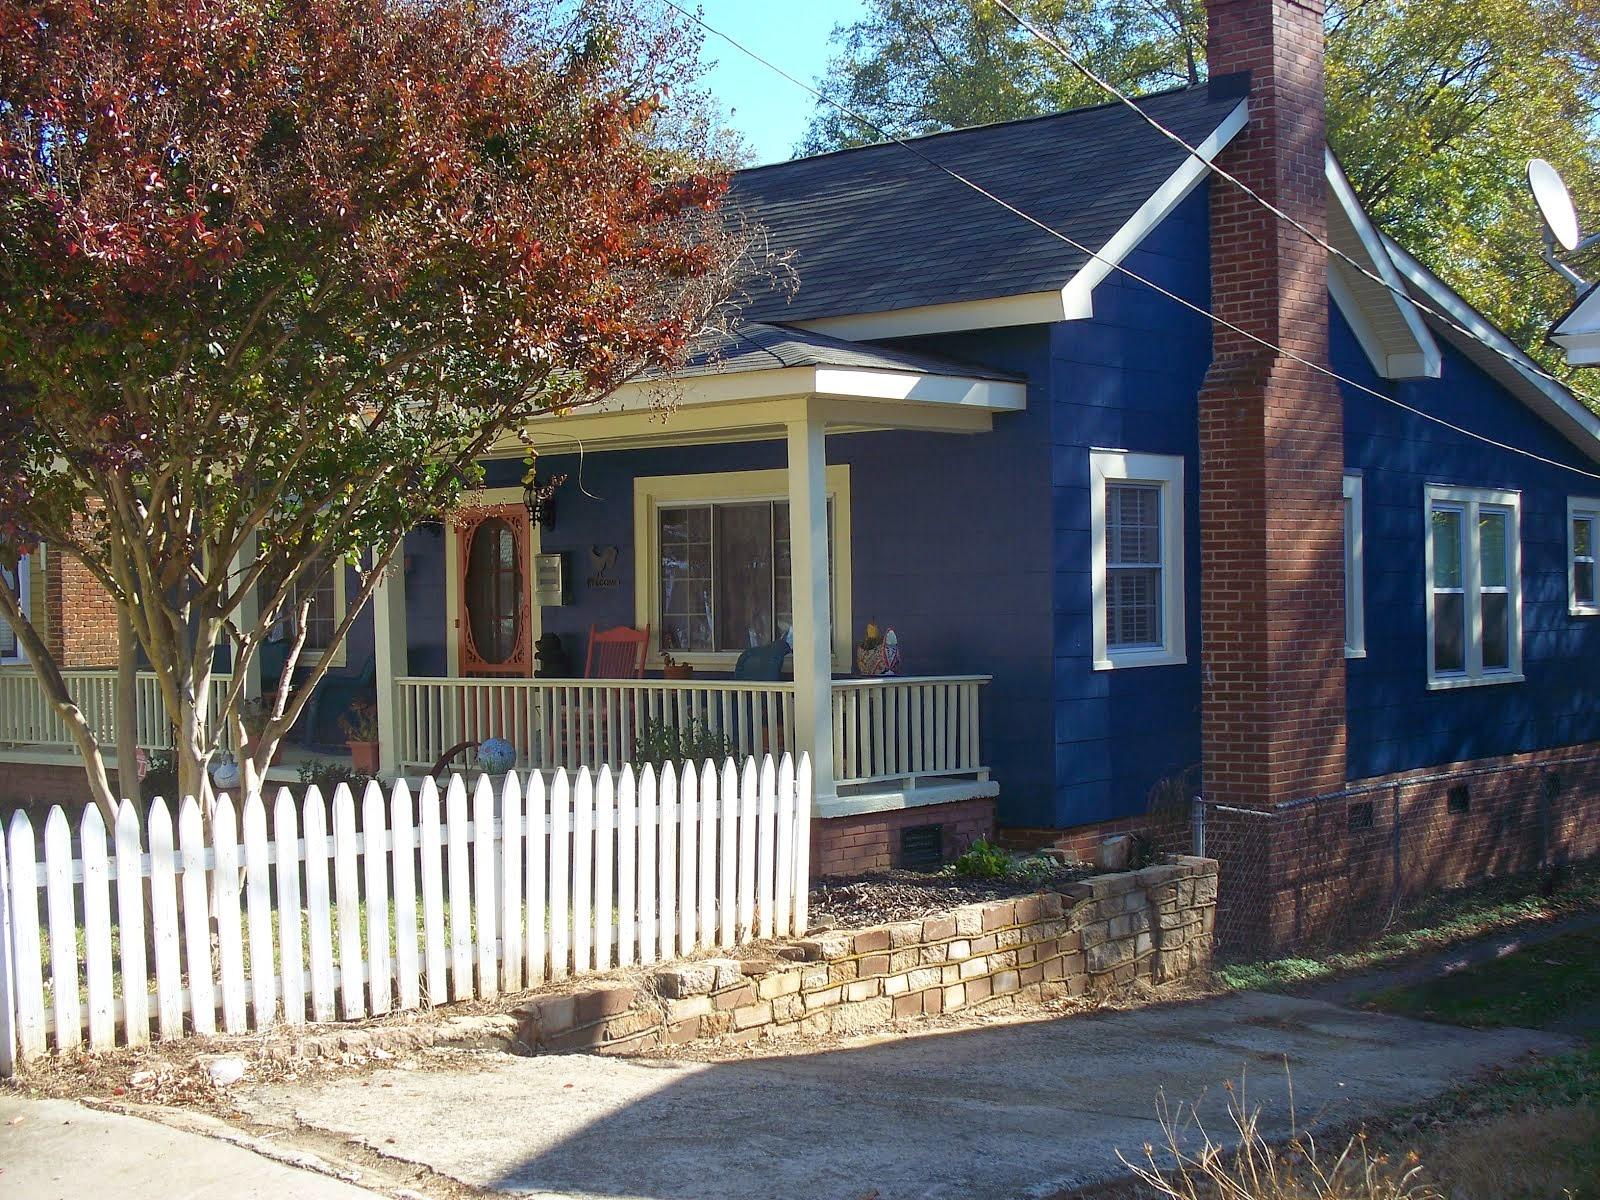 317 S. Shaver Street, Salisbury NC ~ circa 1900 ~ $94,900